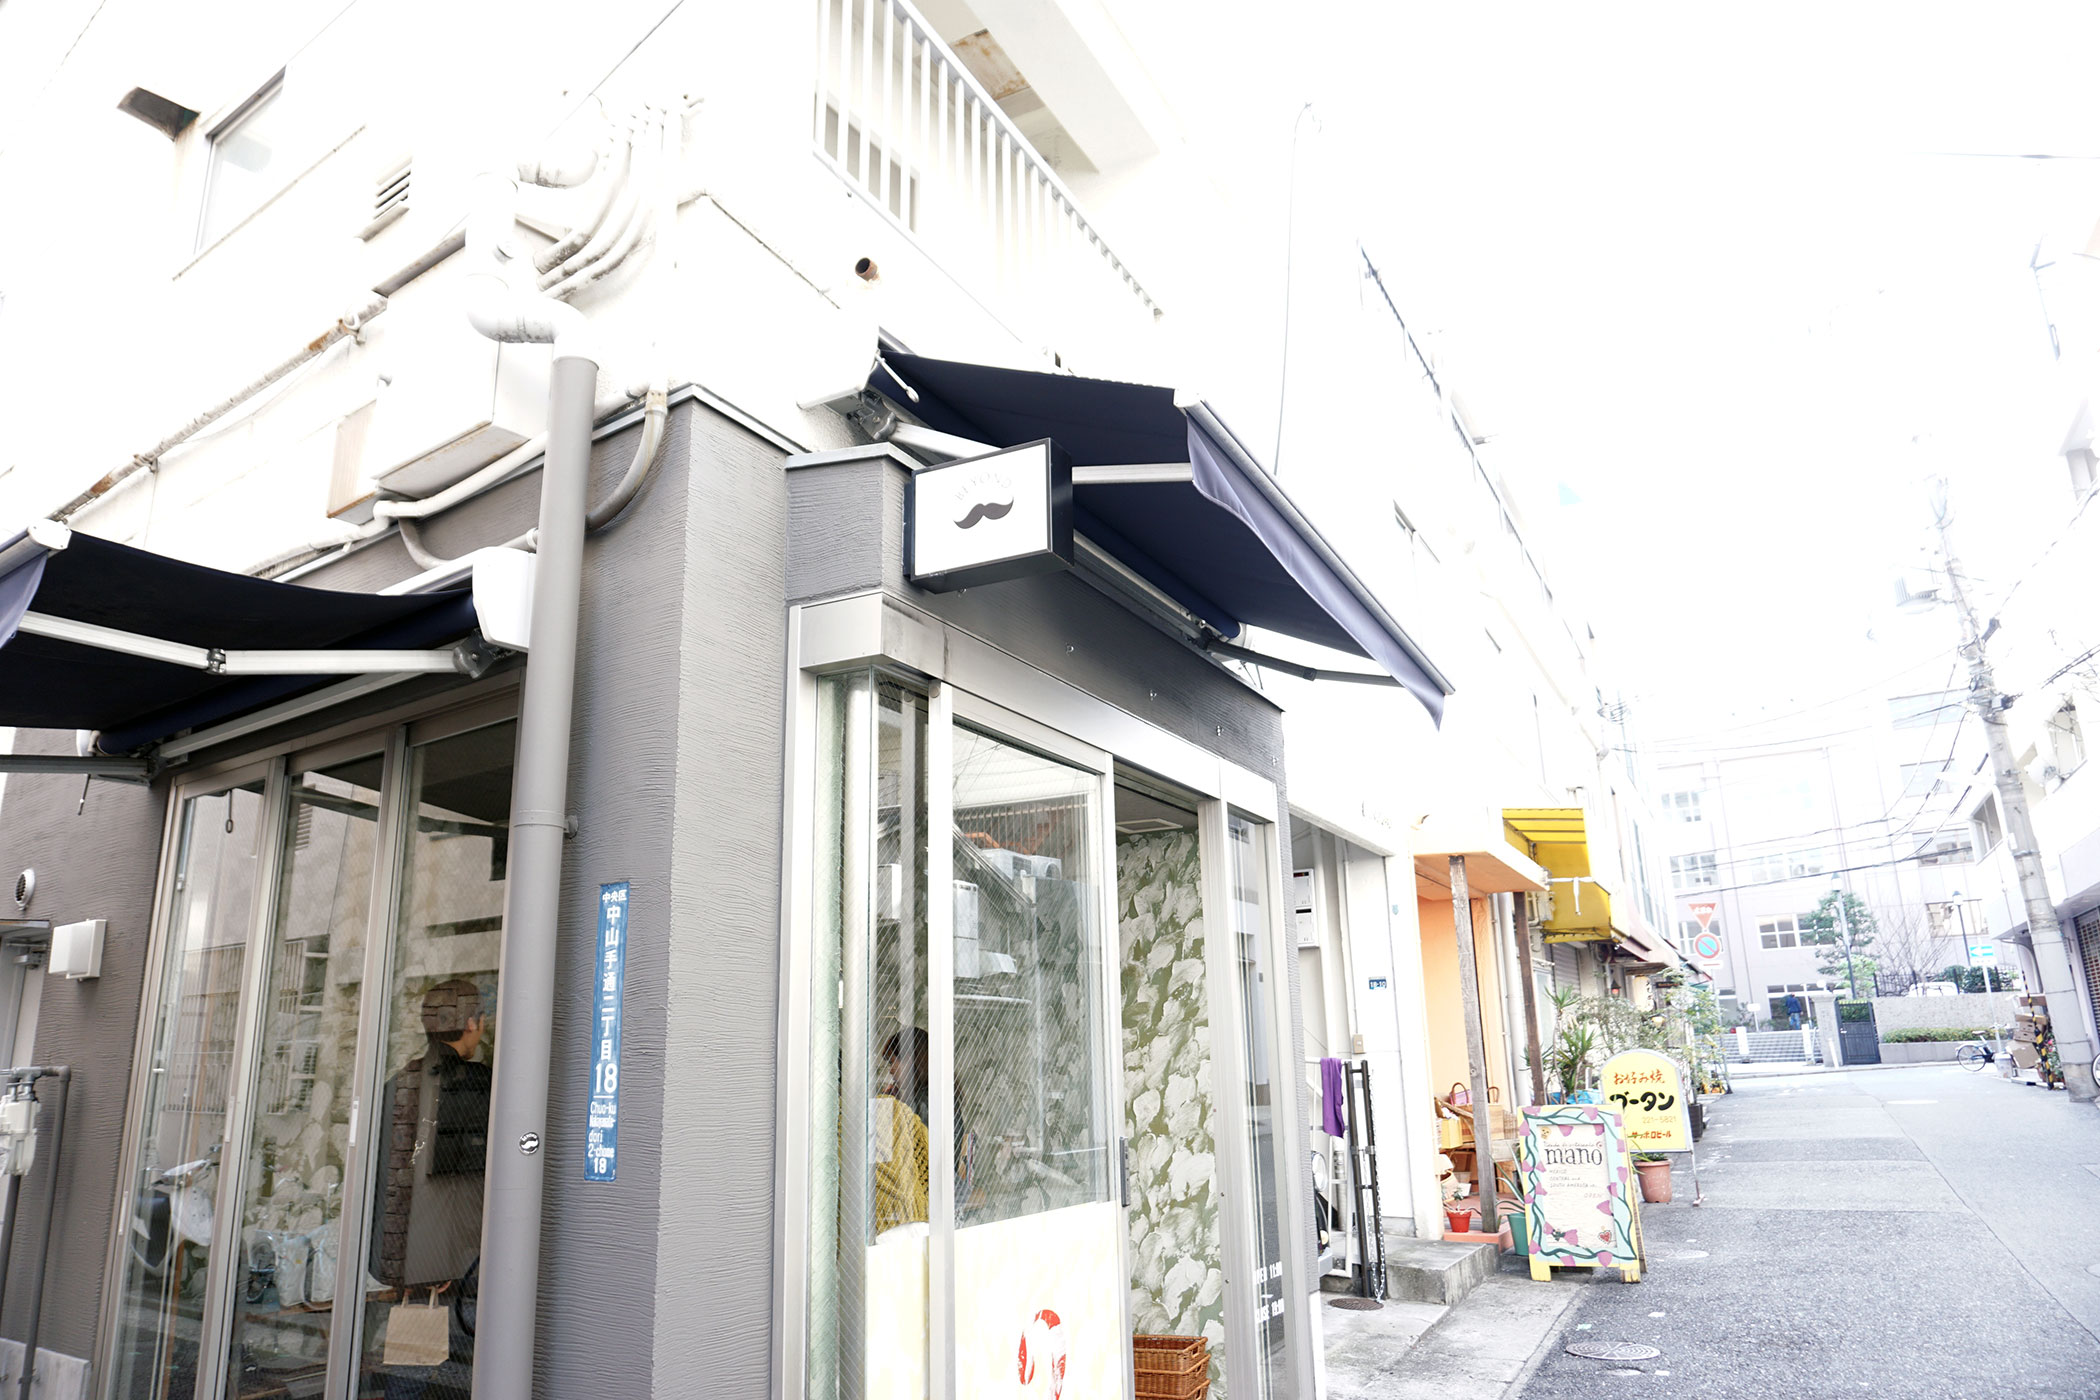 BEYOND COFFEE ROASTERS 2号店 - 神戸 - スペシャルなコーヒーを豆だけでなくスタンドでも